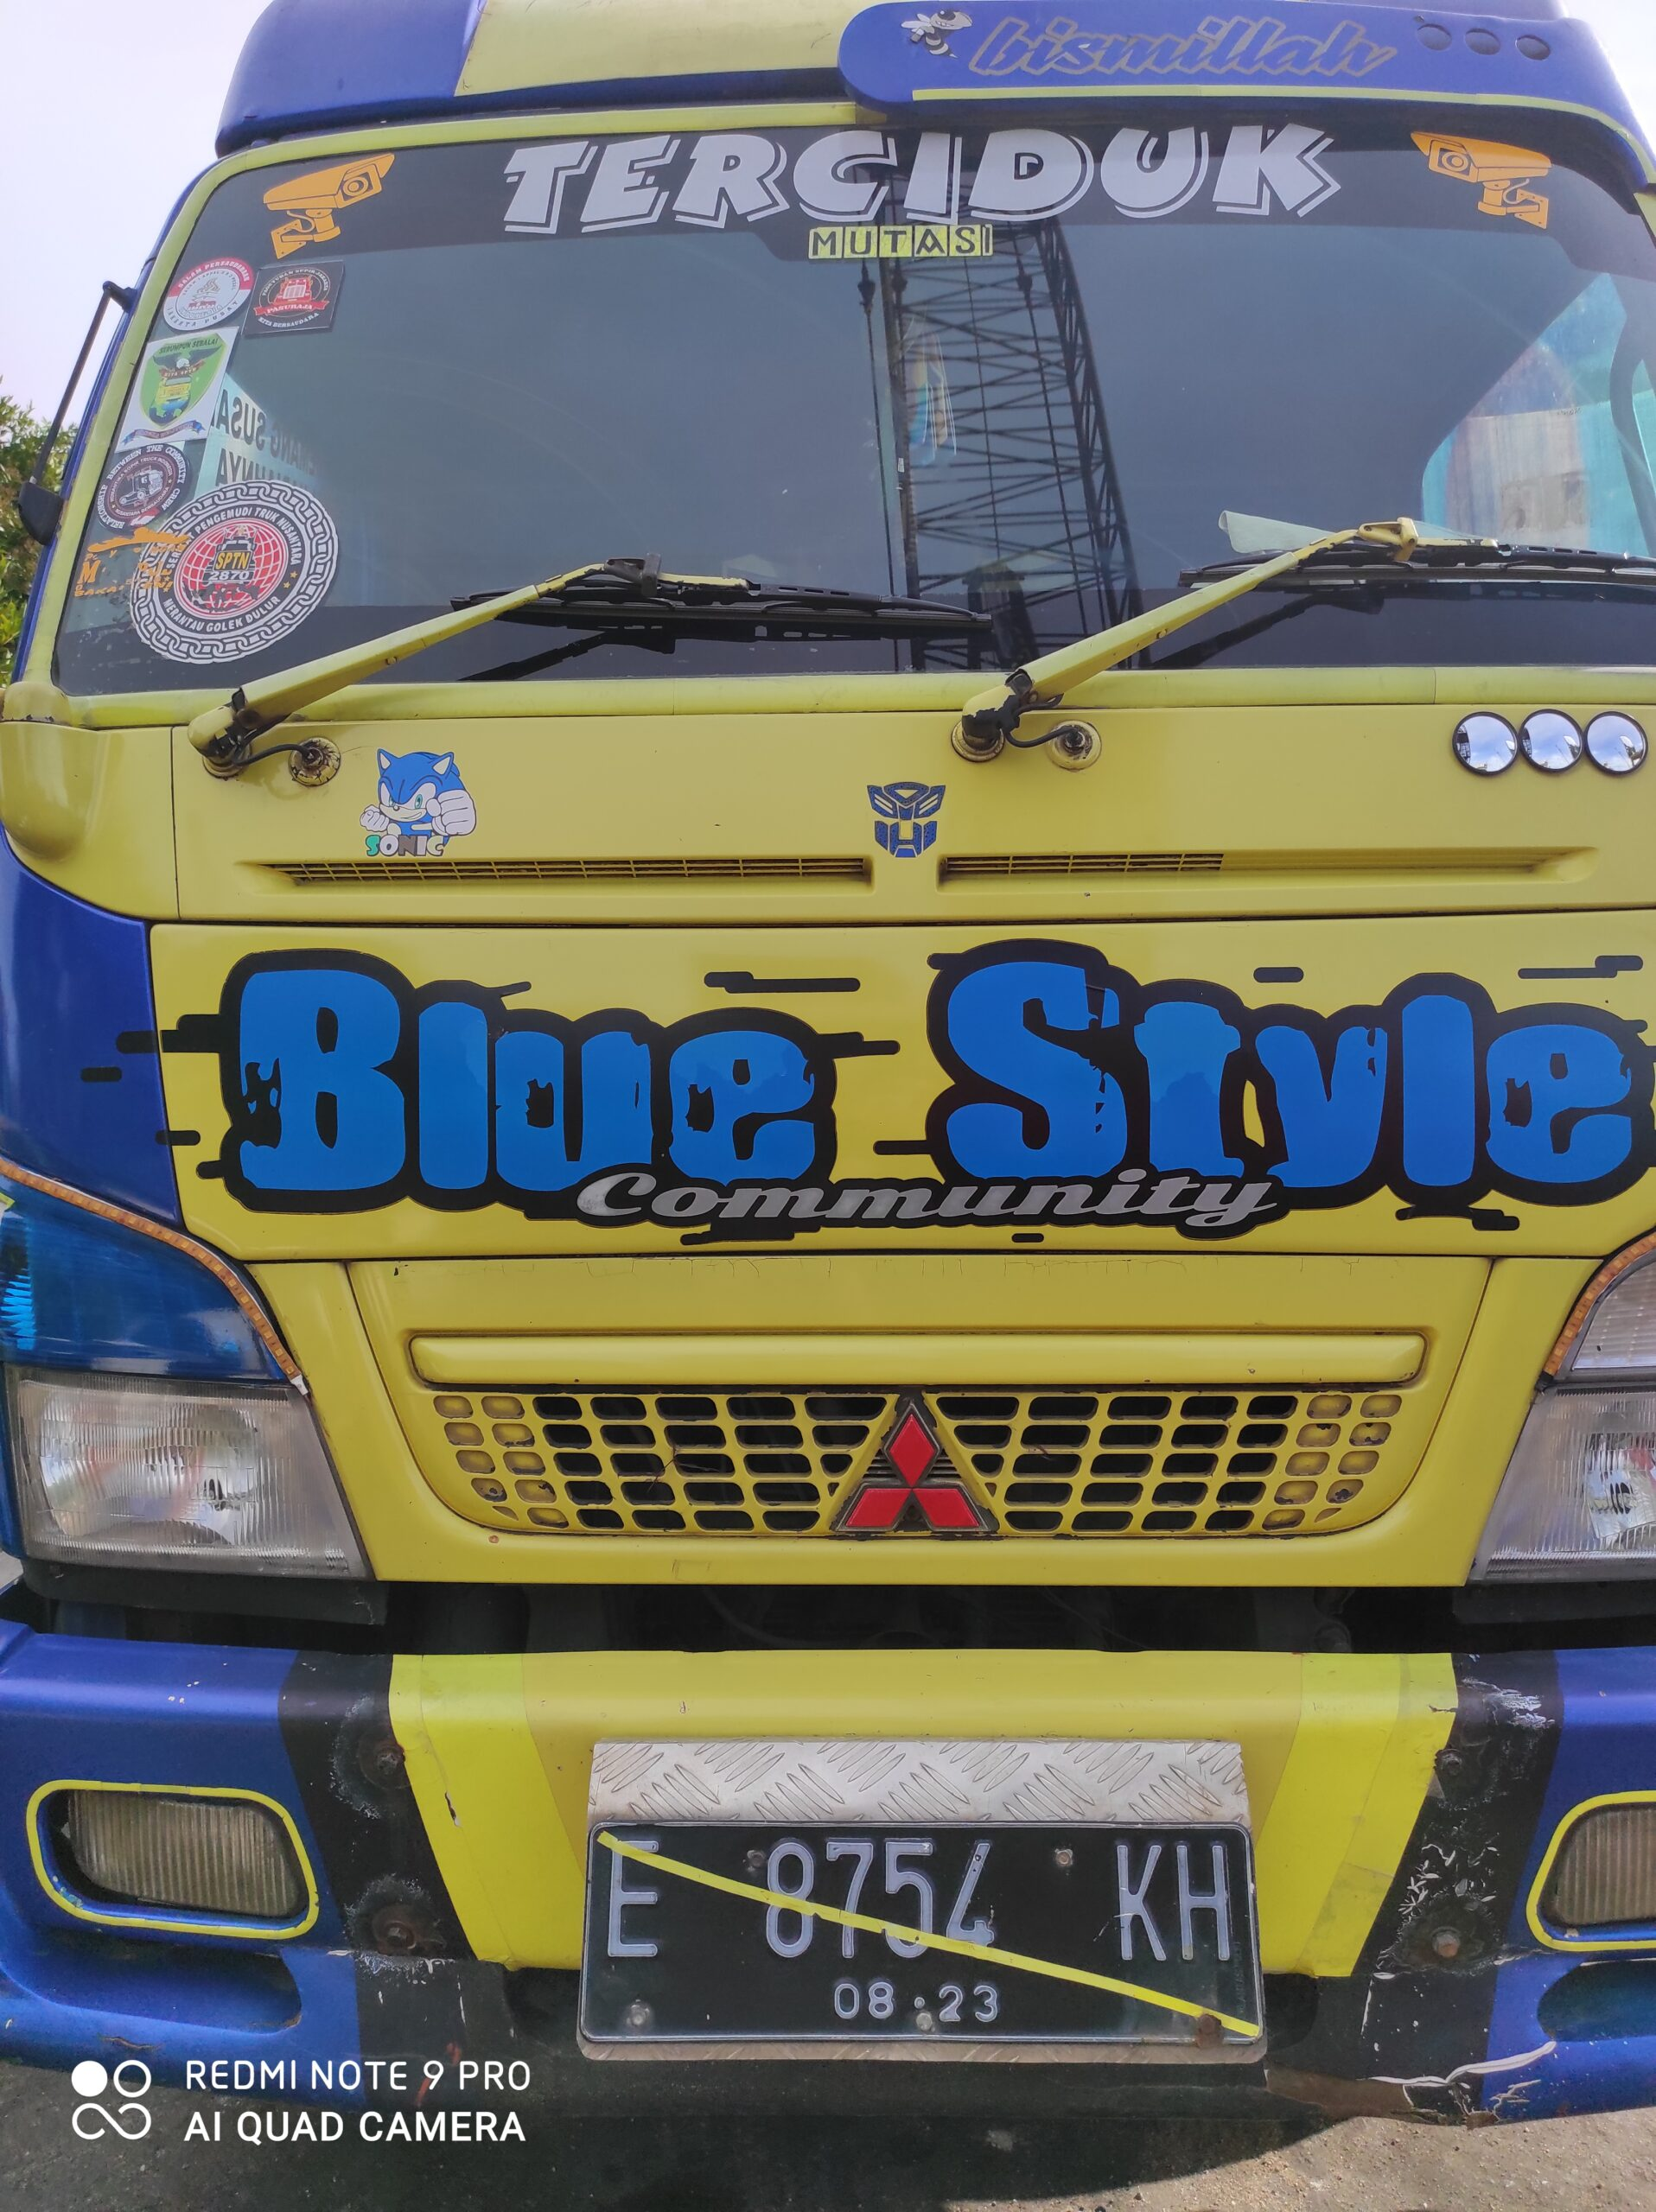 Truck Bermuatan Besi Rongsokan Nopol E 8754 KH Tertahan Di Ditpolair Polda Kepulauan Bangka Belitung Diduga Membawa Barang Ilegal Lainnya